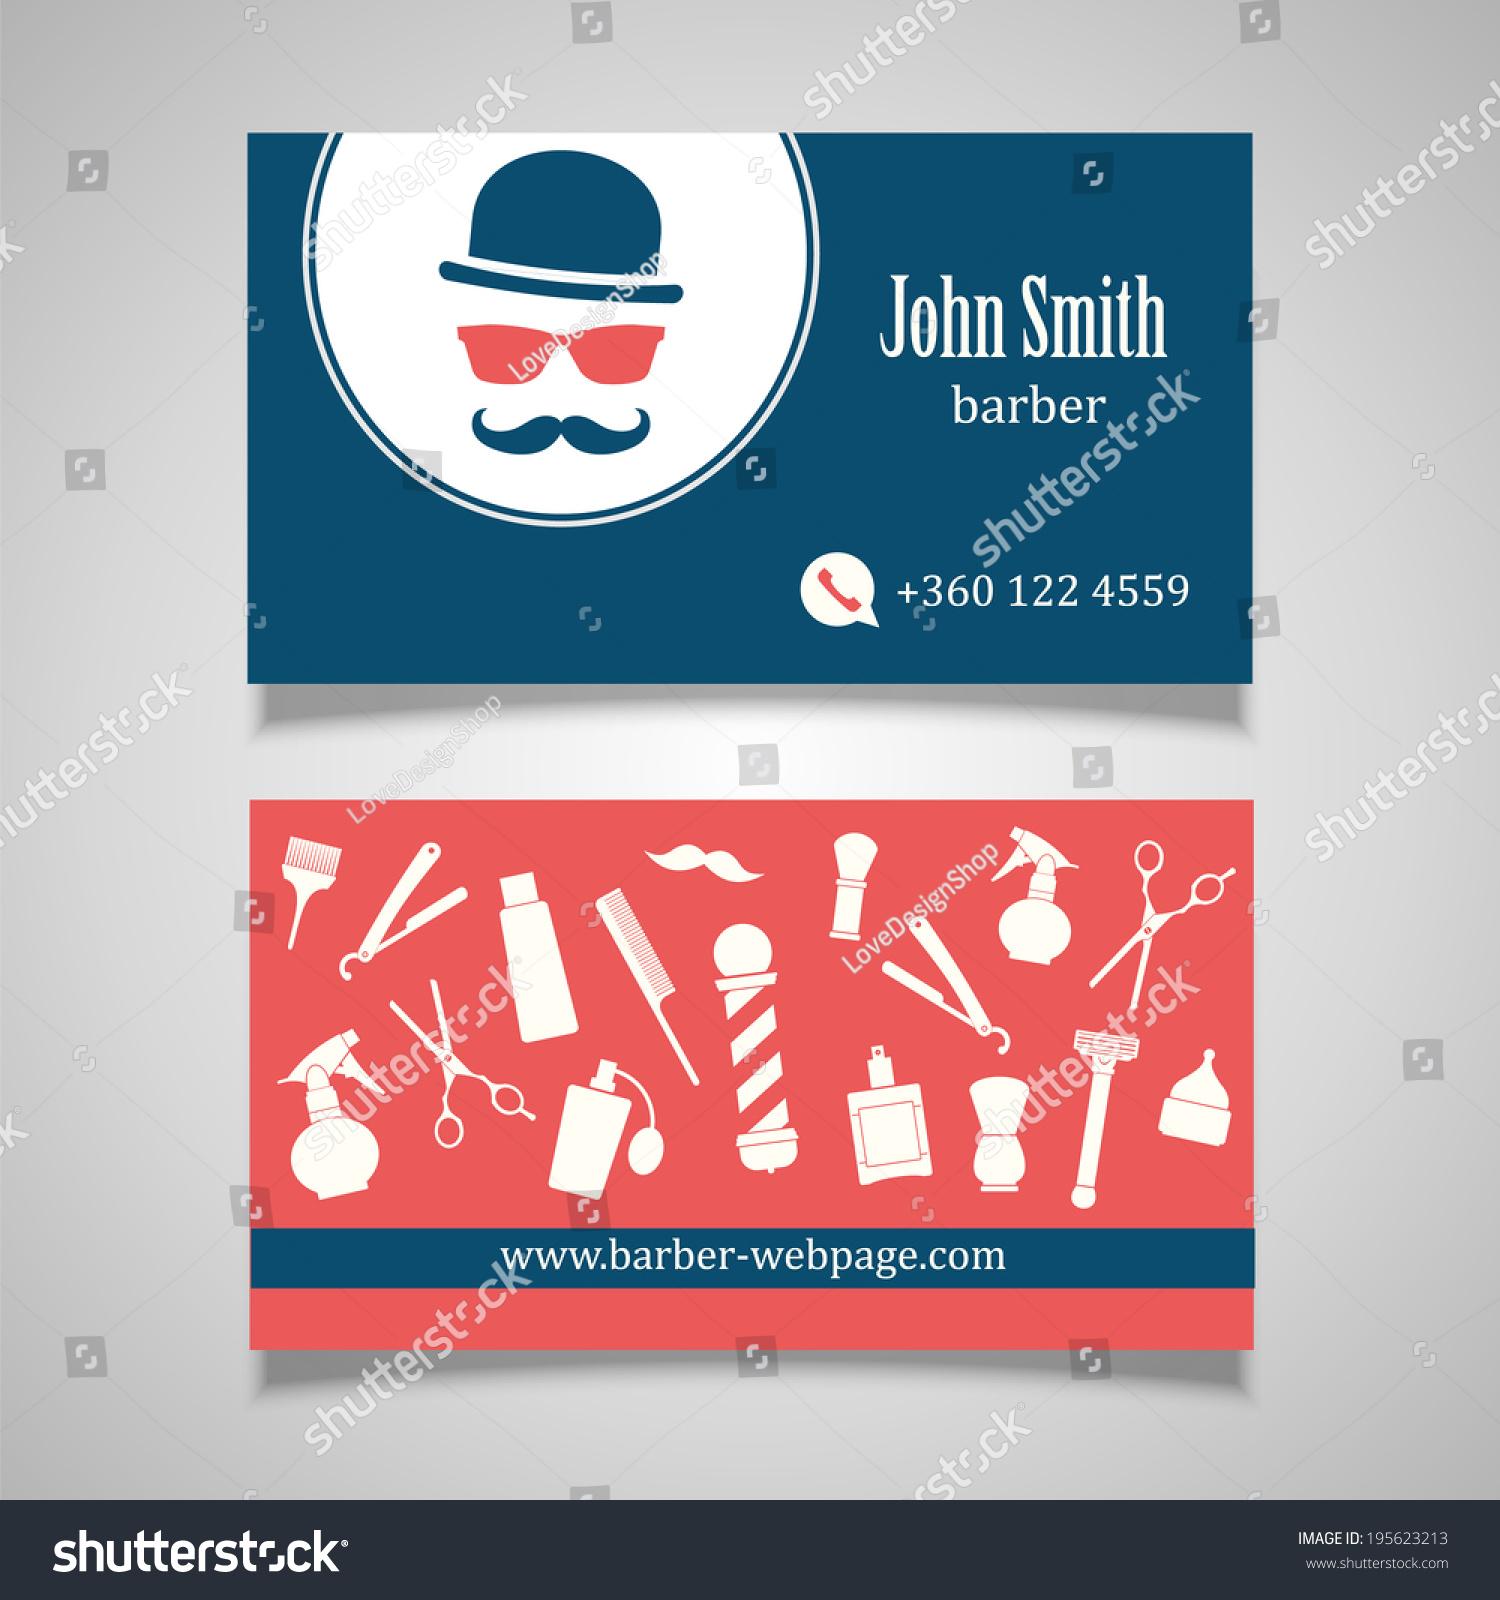 Hair Salon Barber Business Card Design Stock Vector HD (Royalty Free ...